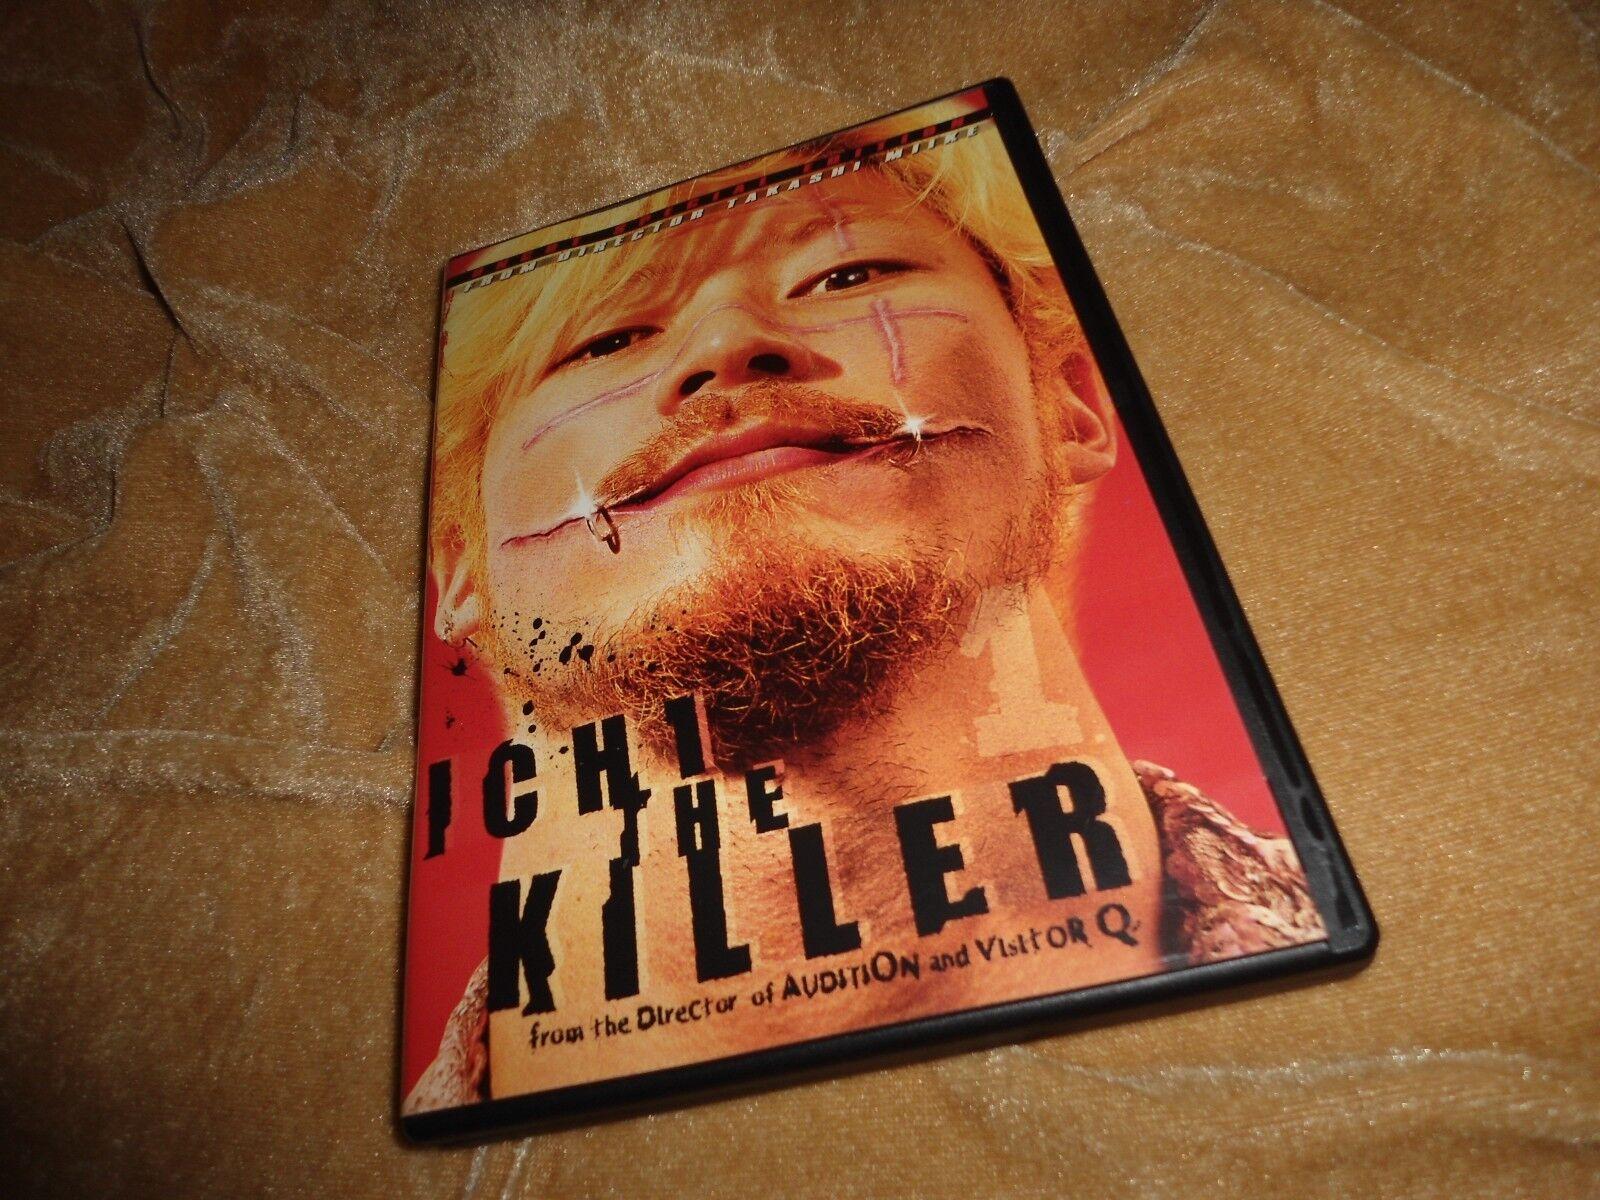 Ichi The Killer 2001 - Uncut Special Edition 1 Disc Region 1 NTSC DVD  - $21.99